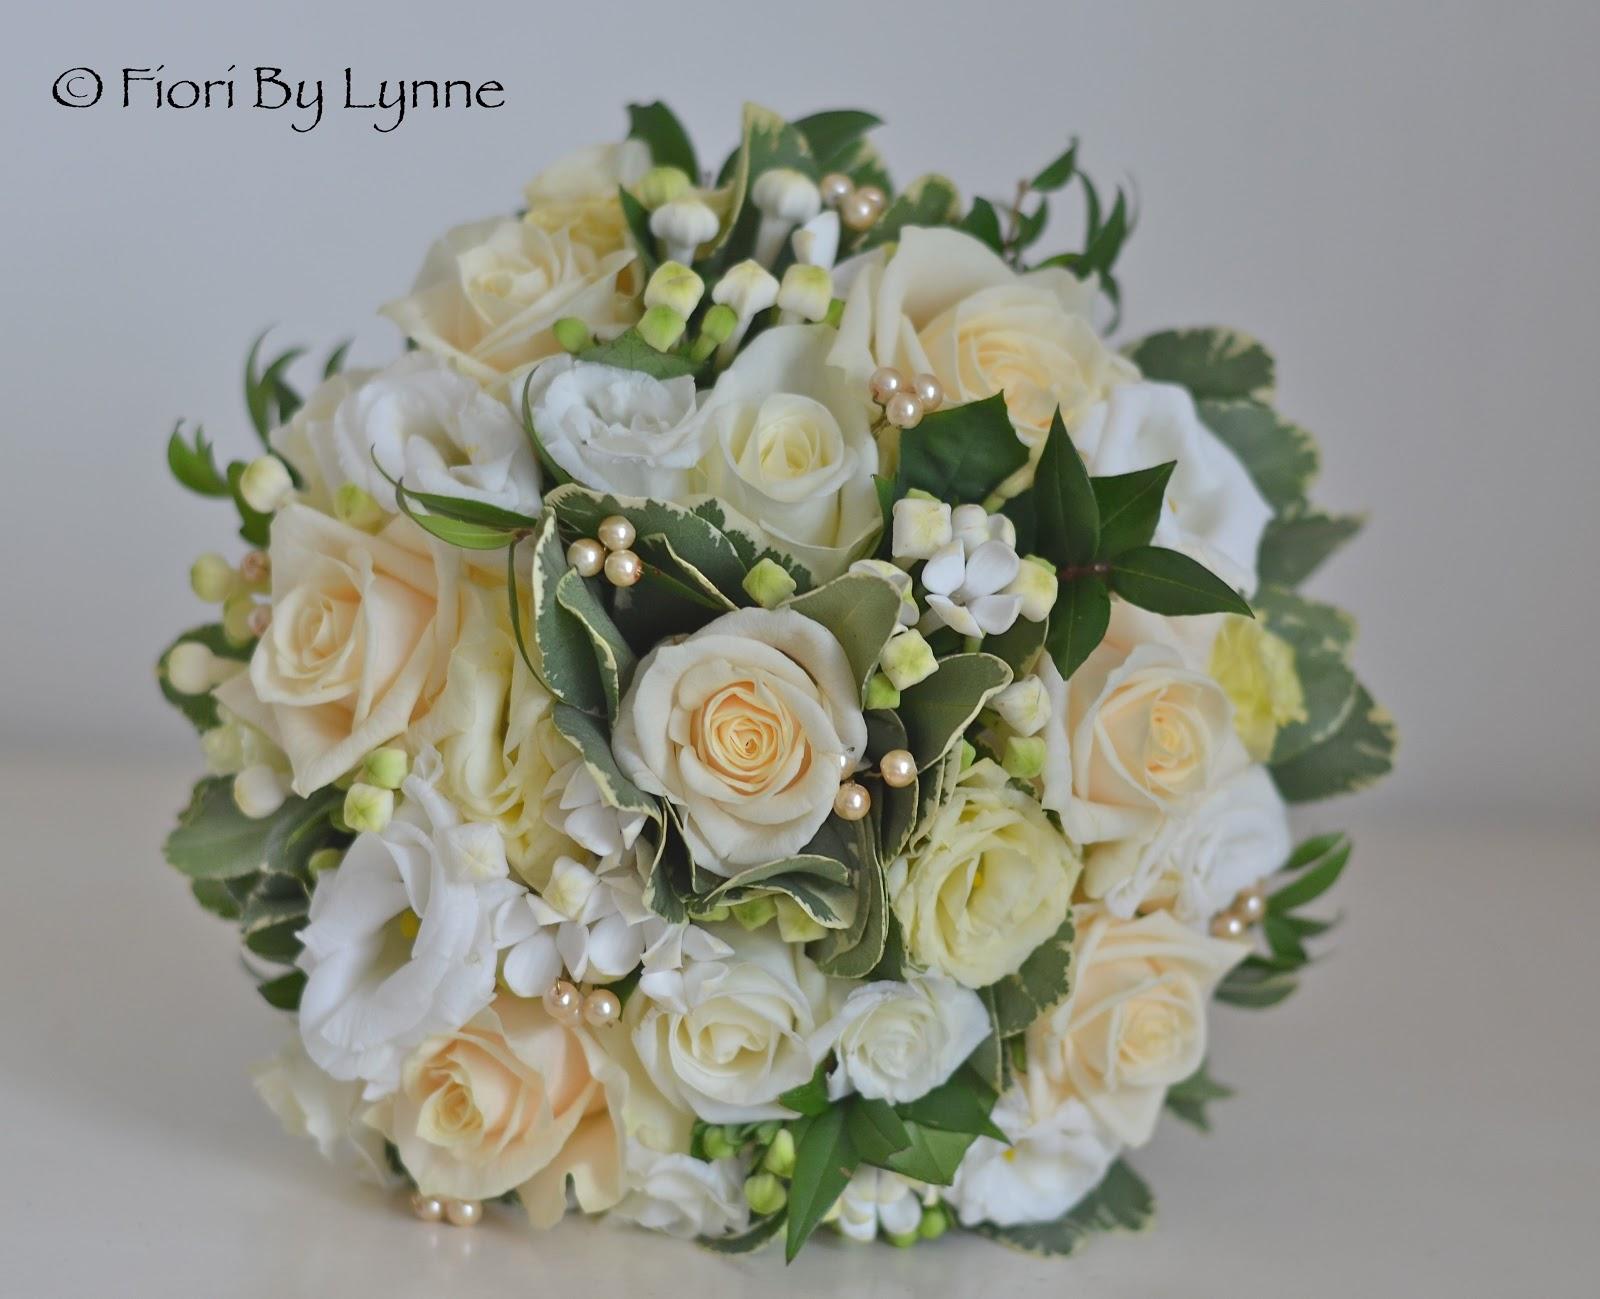 Wedding flowers blog kirsty s vintage gold wedding for Gold flowers for wedding bouquet